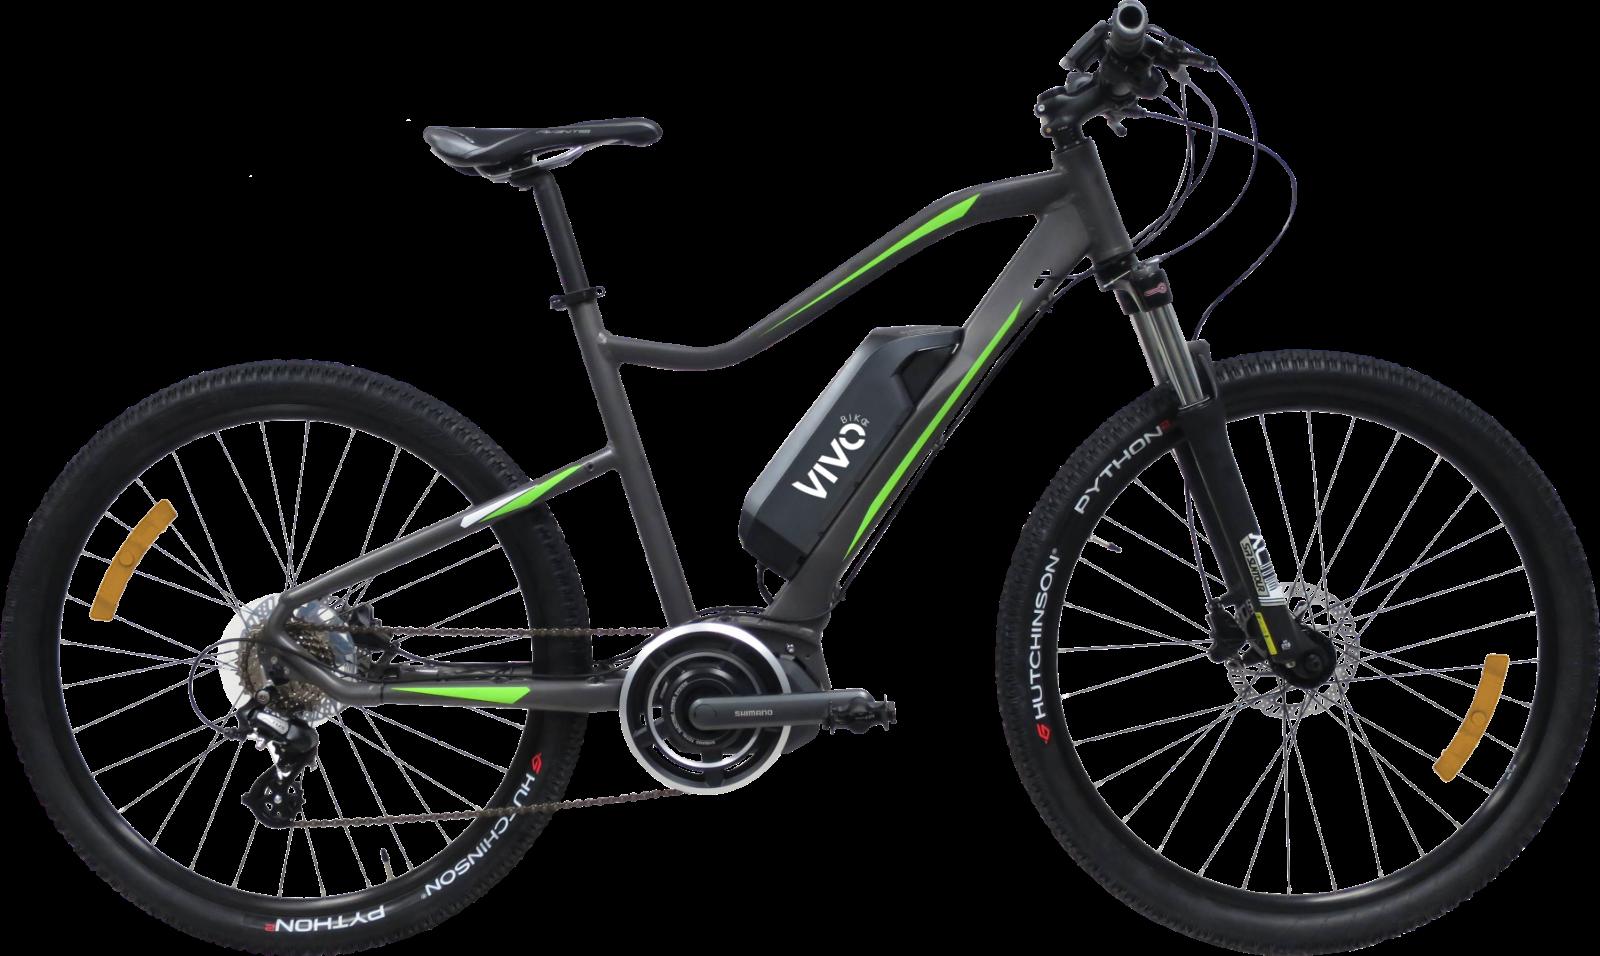 Noleggio Bici MTB M1 - Valdobbiadene